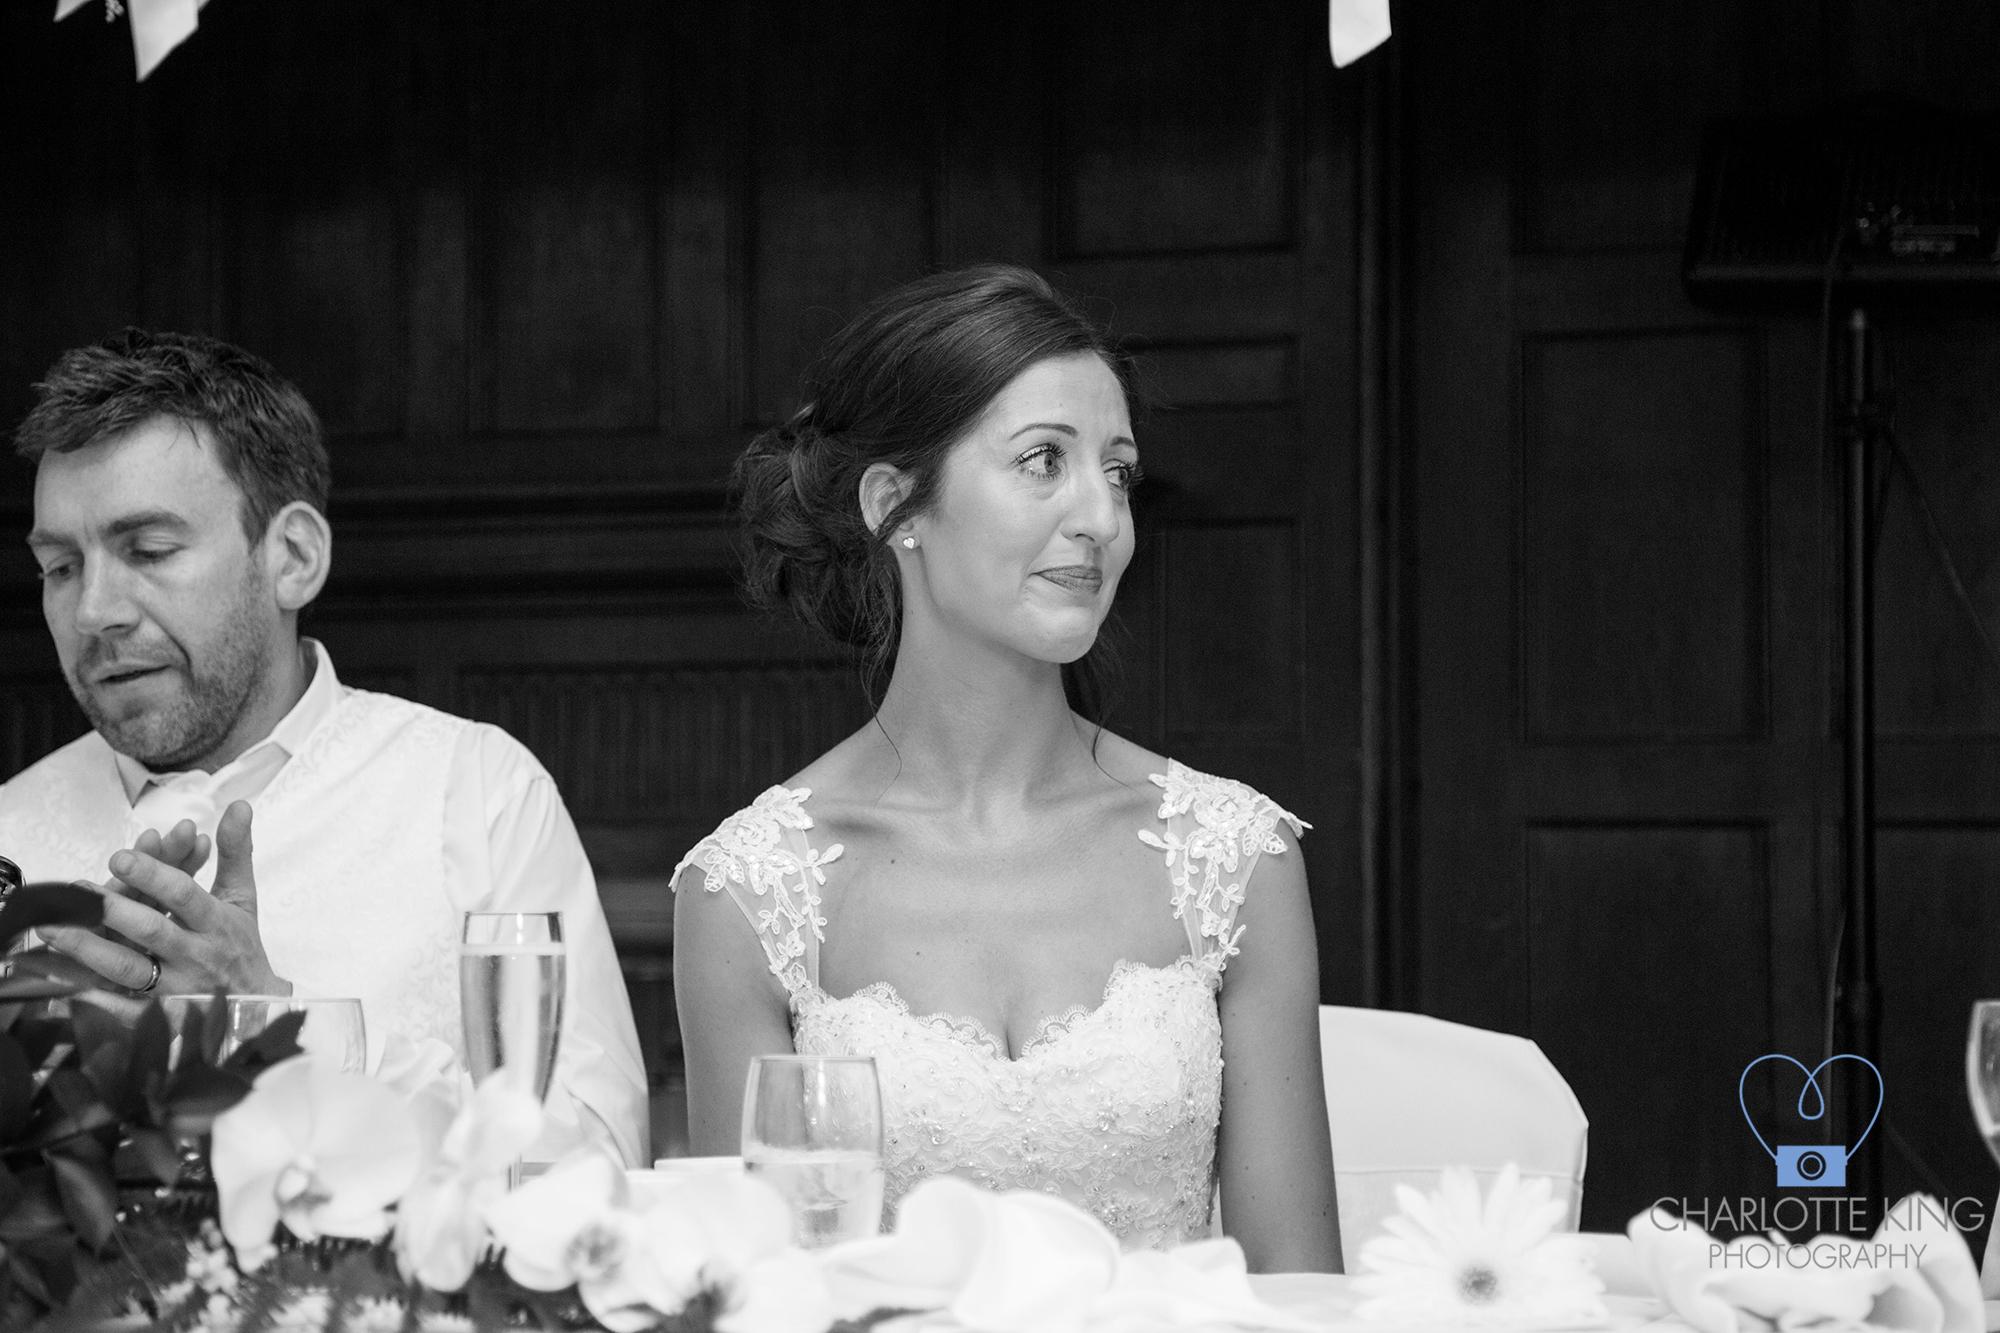 Woldingham-school-wedding-charlotte-king-photography (188)